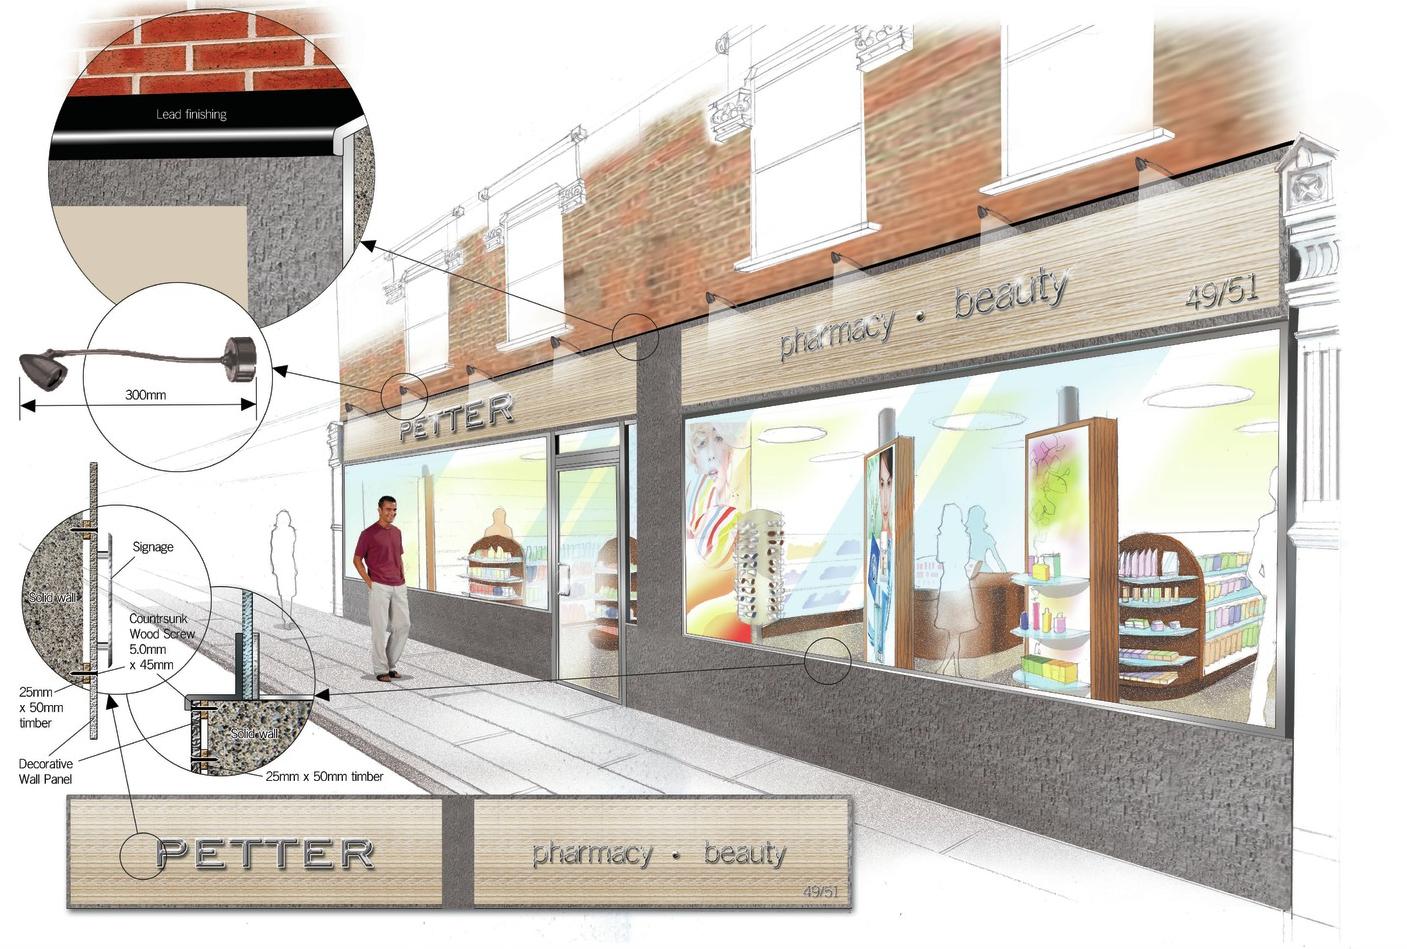 Signage Design for Petter Pharmacy